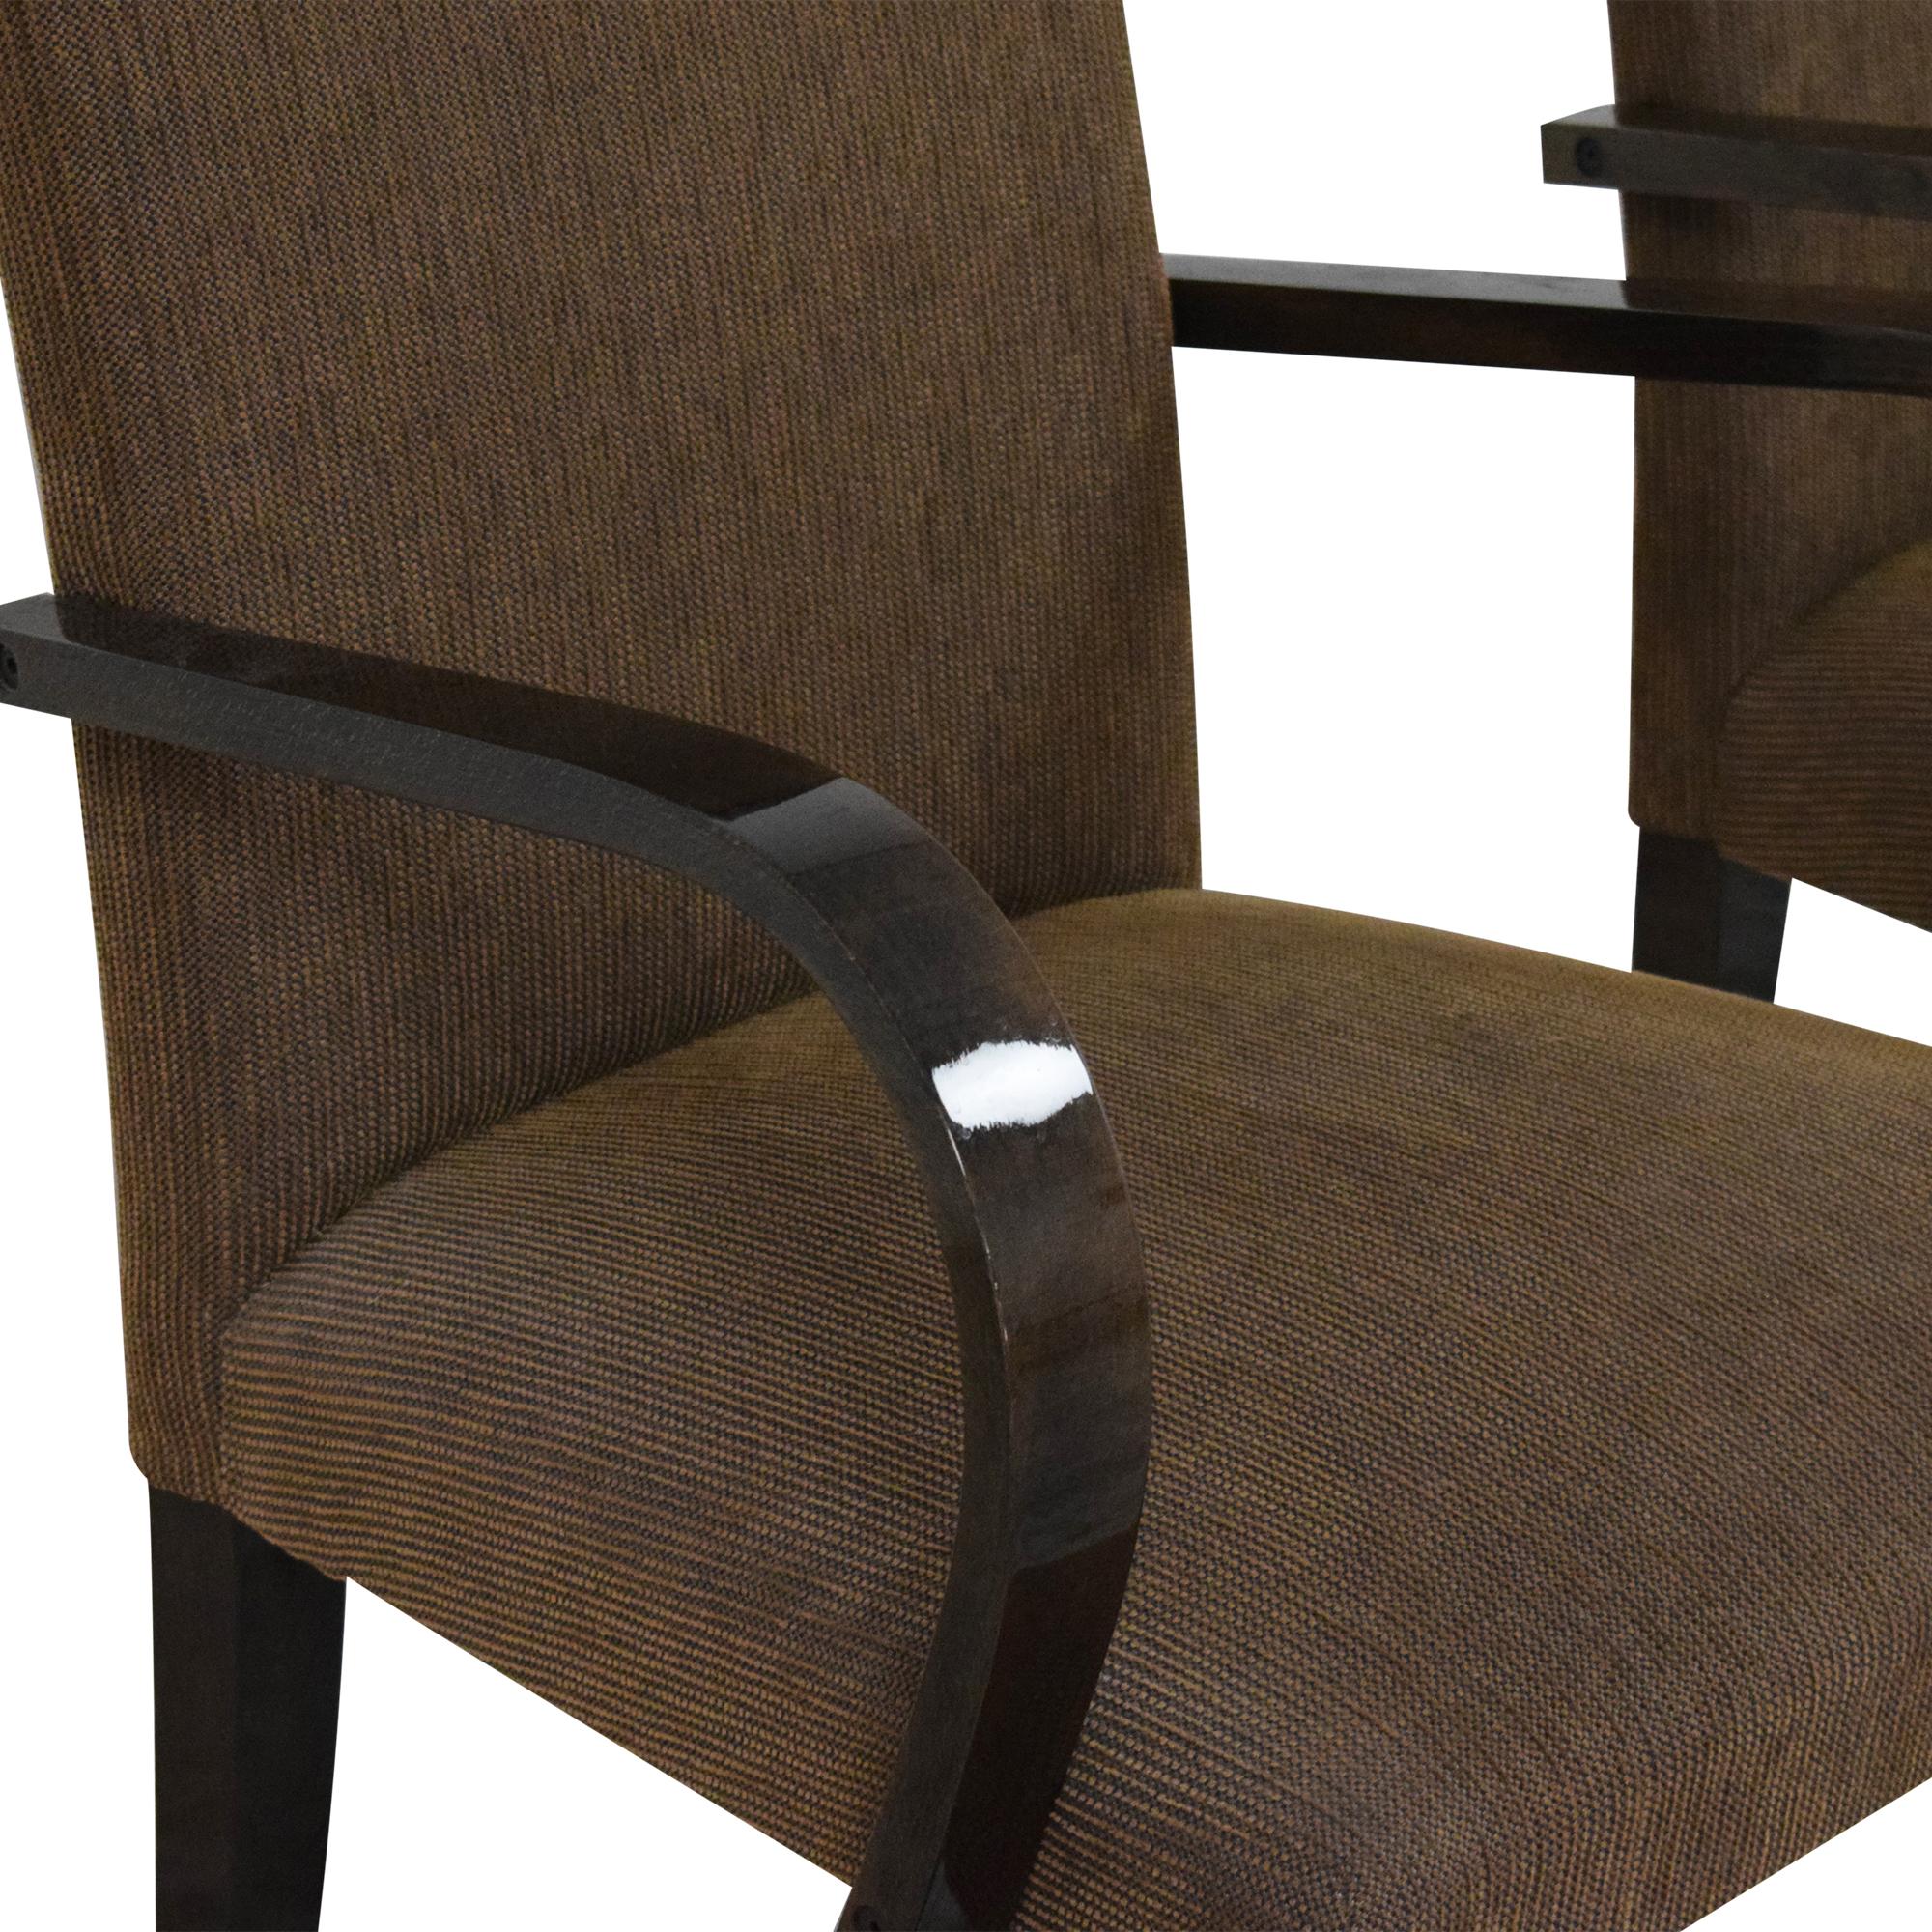 Pietro Costantini Pietro Costantini High Back Dining Arm Chairs price